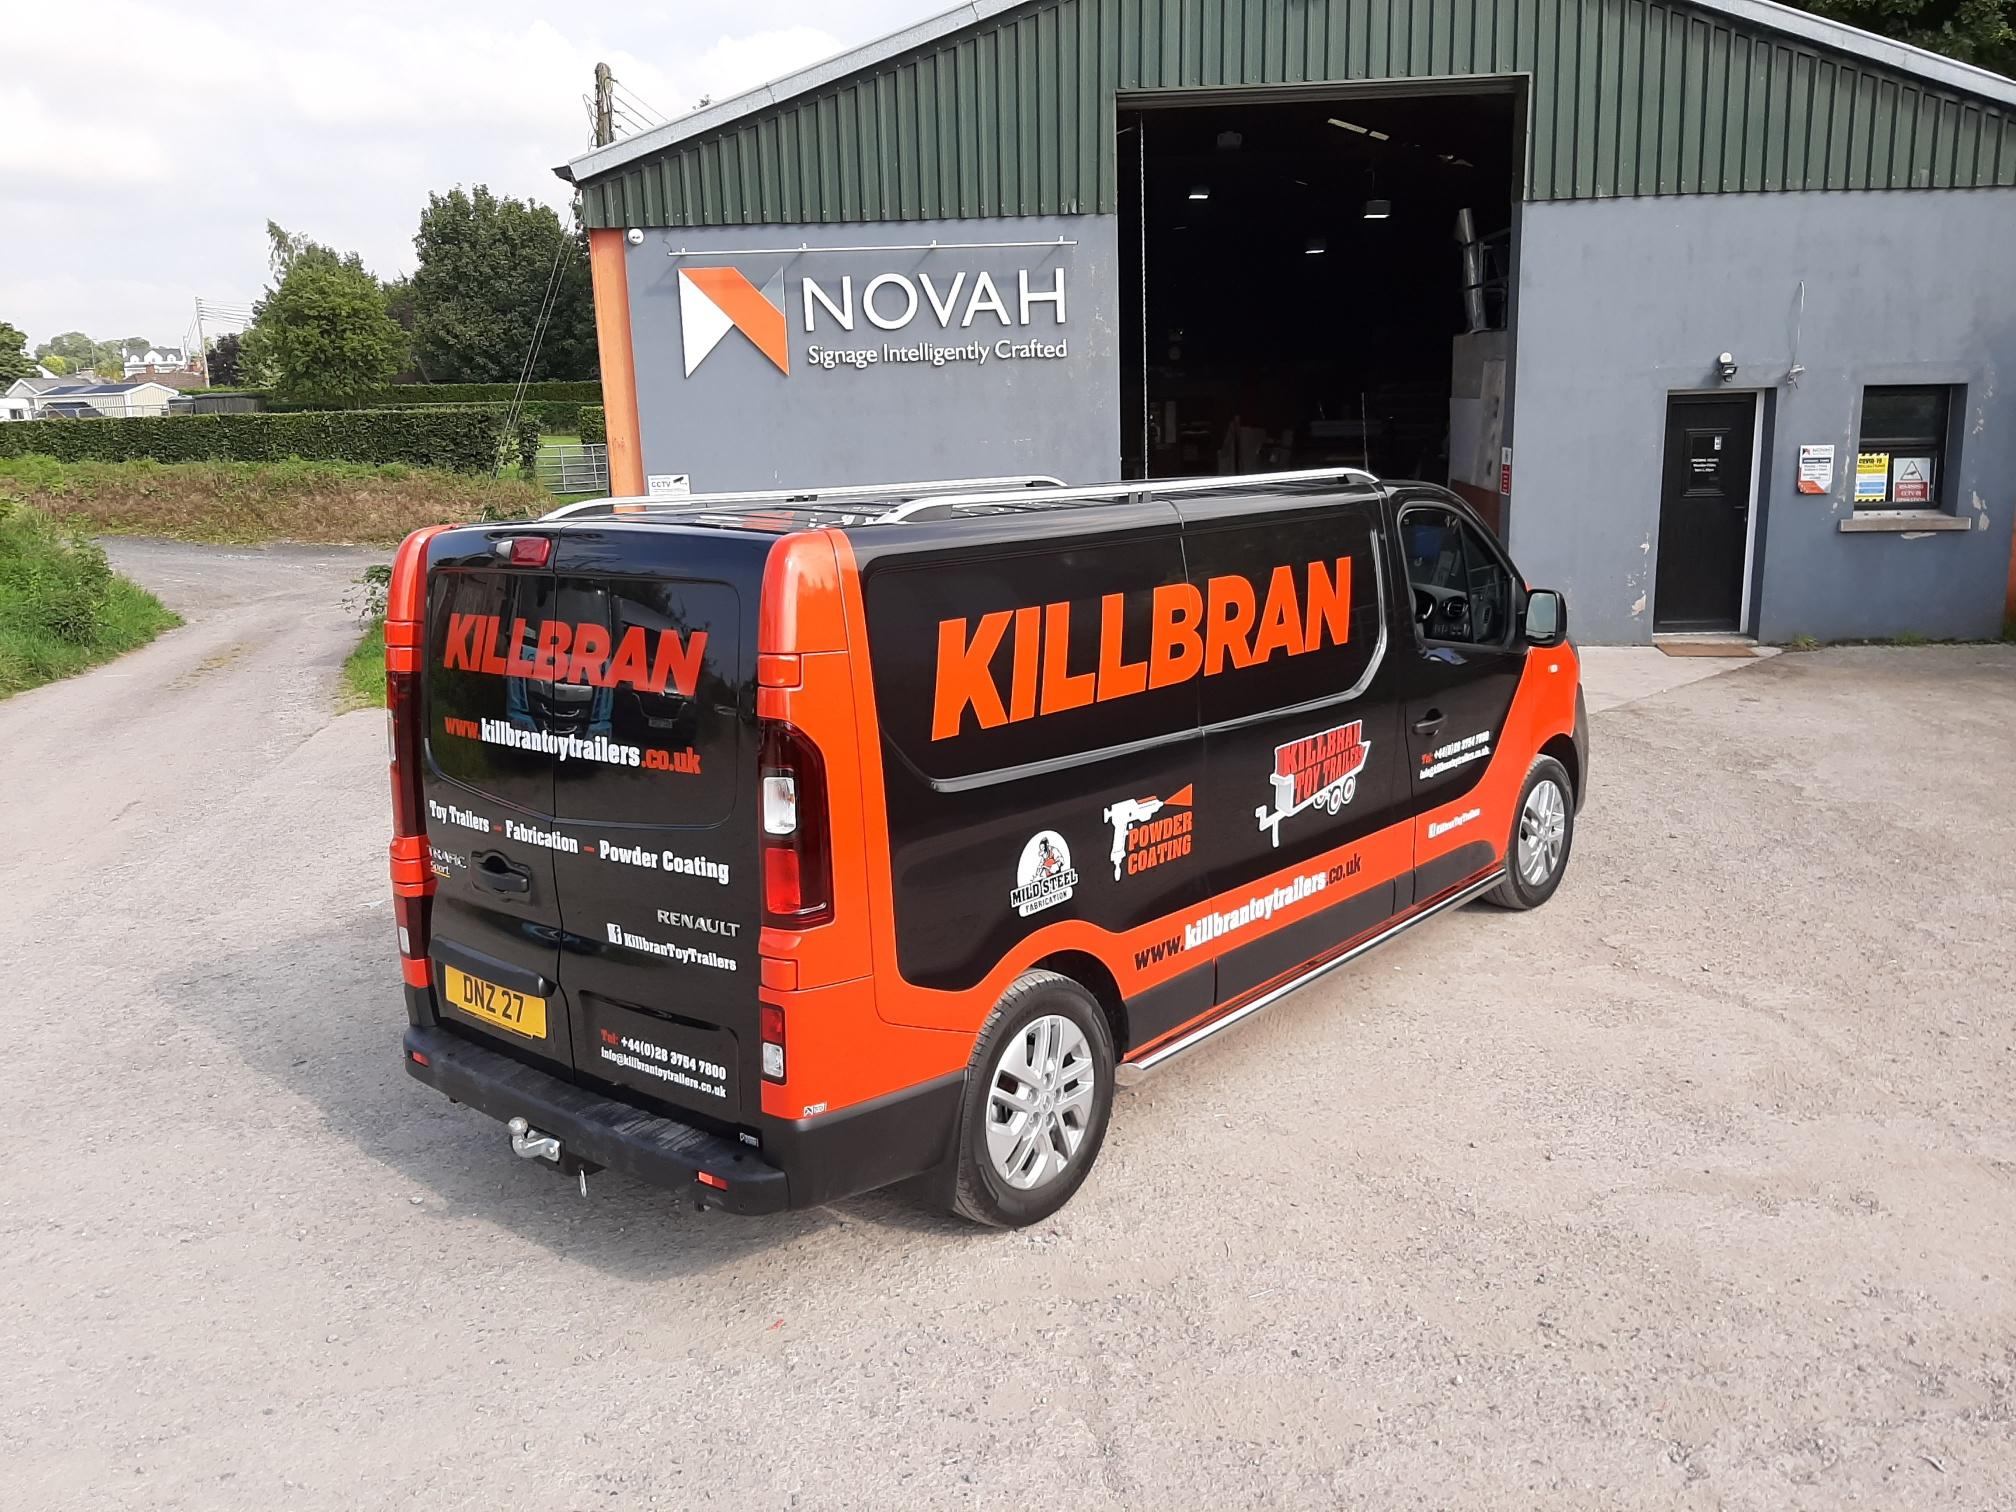 Killbran Vehicle Halfwrap